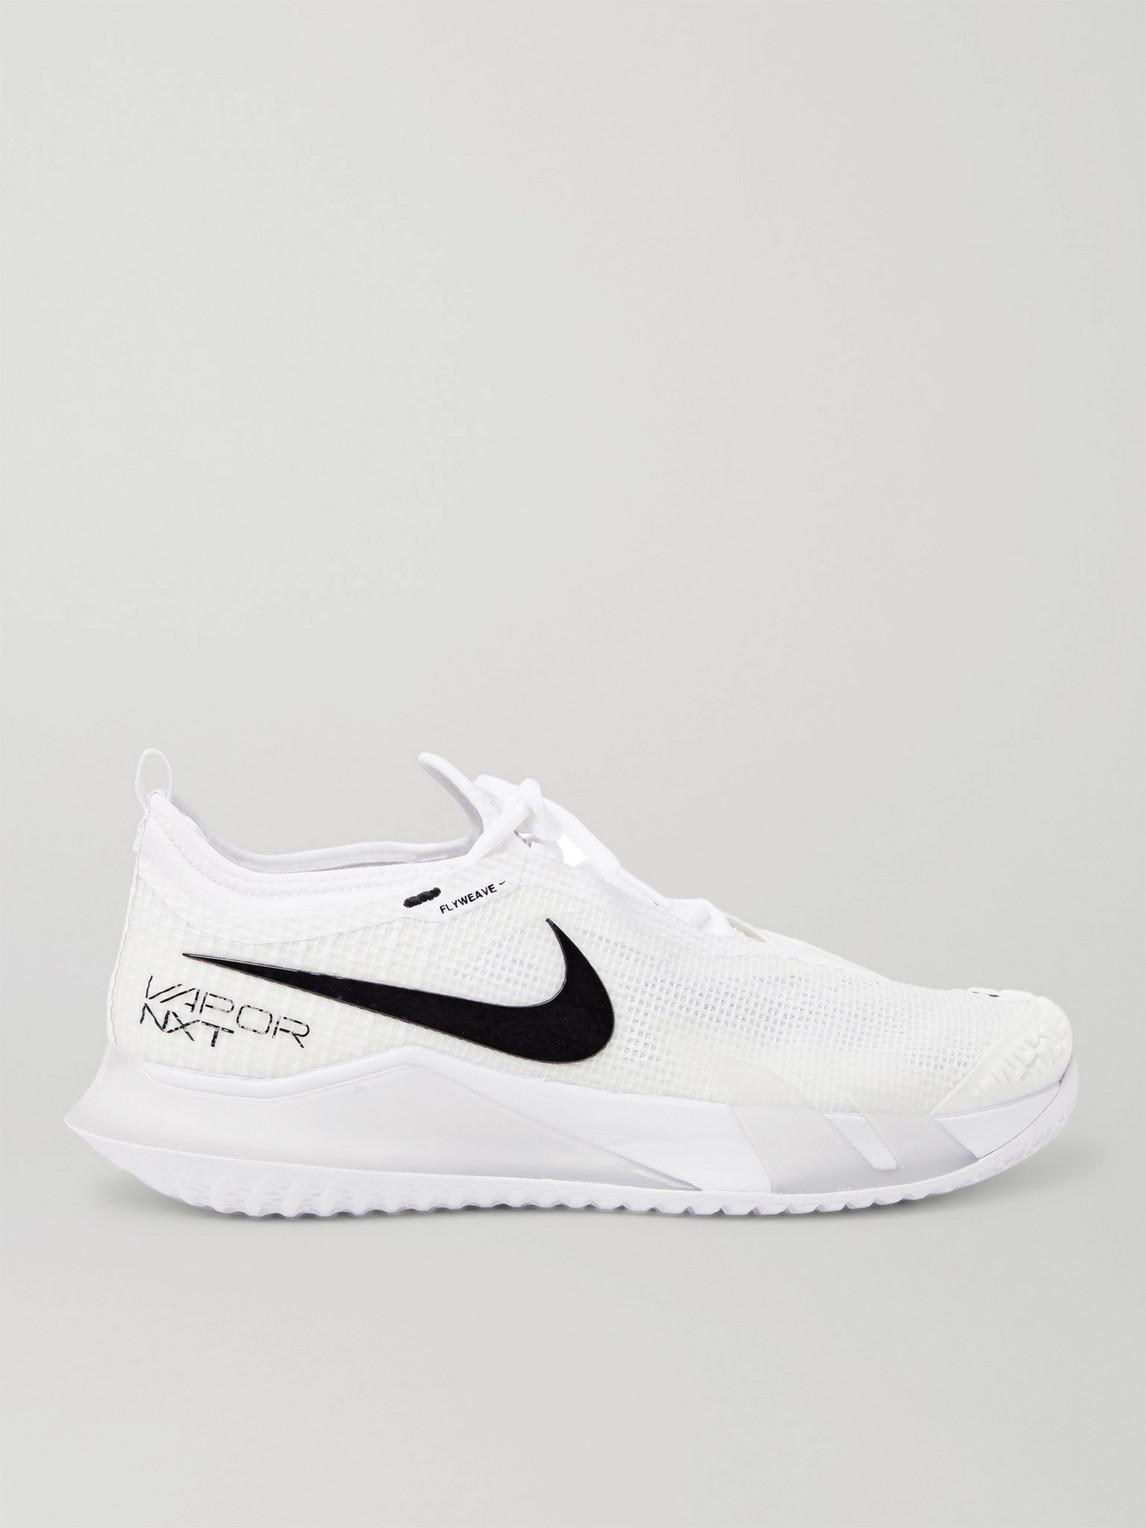 Nike Tennis - Nikecourt React Vapor Nxt Rubber-Trimmed Flyweave Tennis Sneakers - Men - White - 8.5